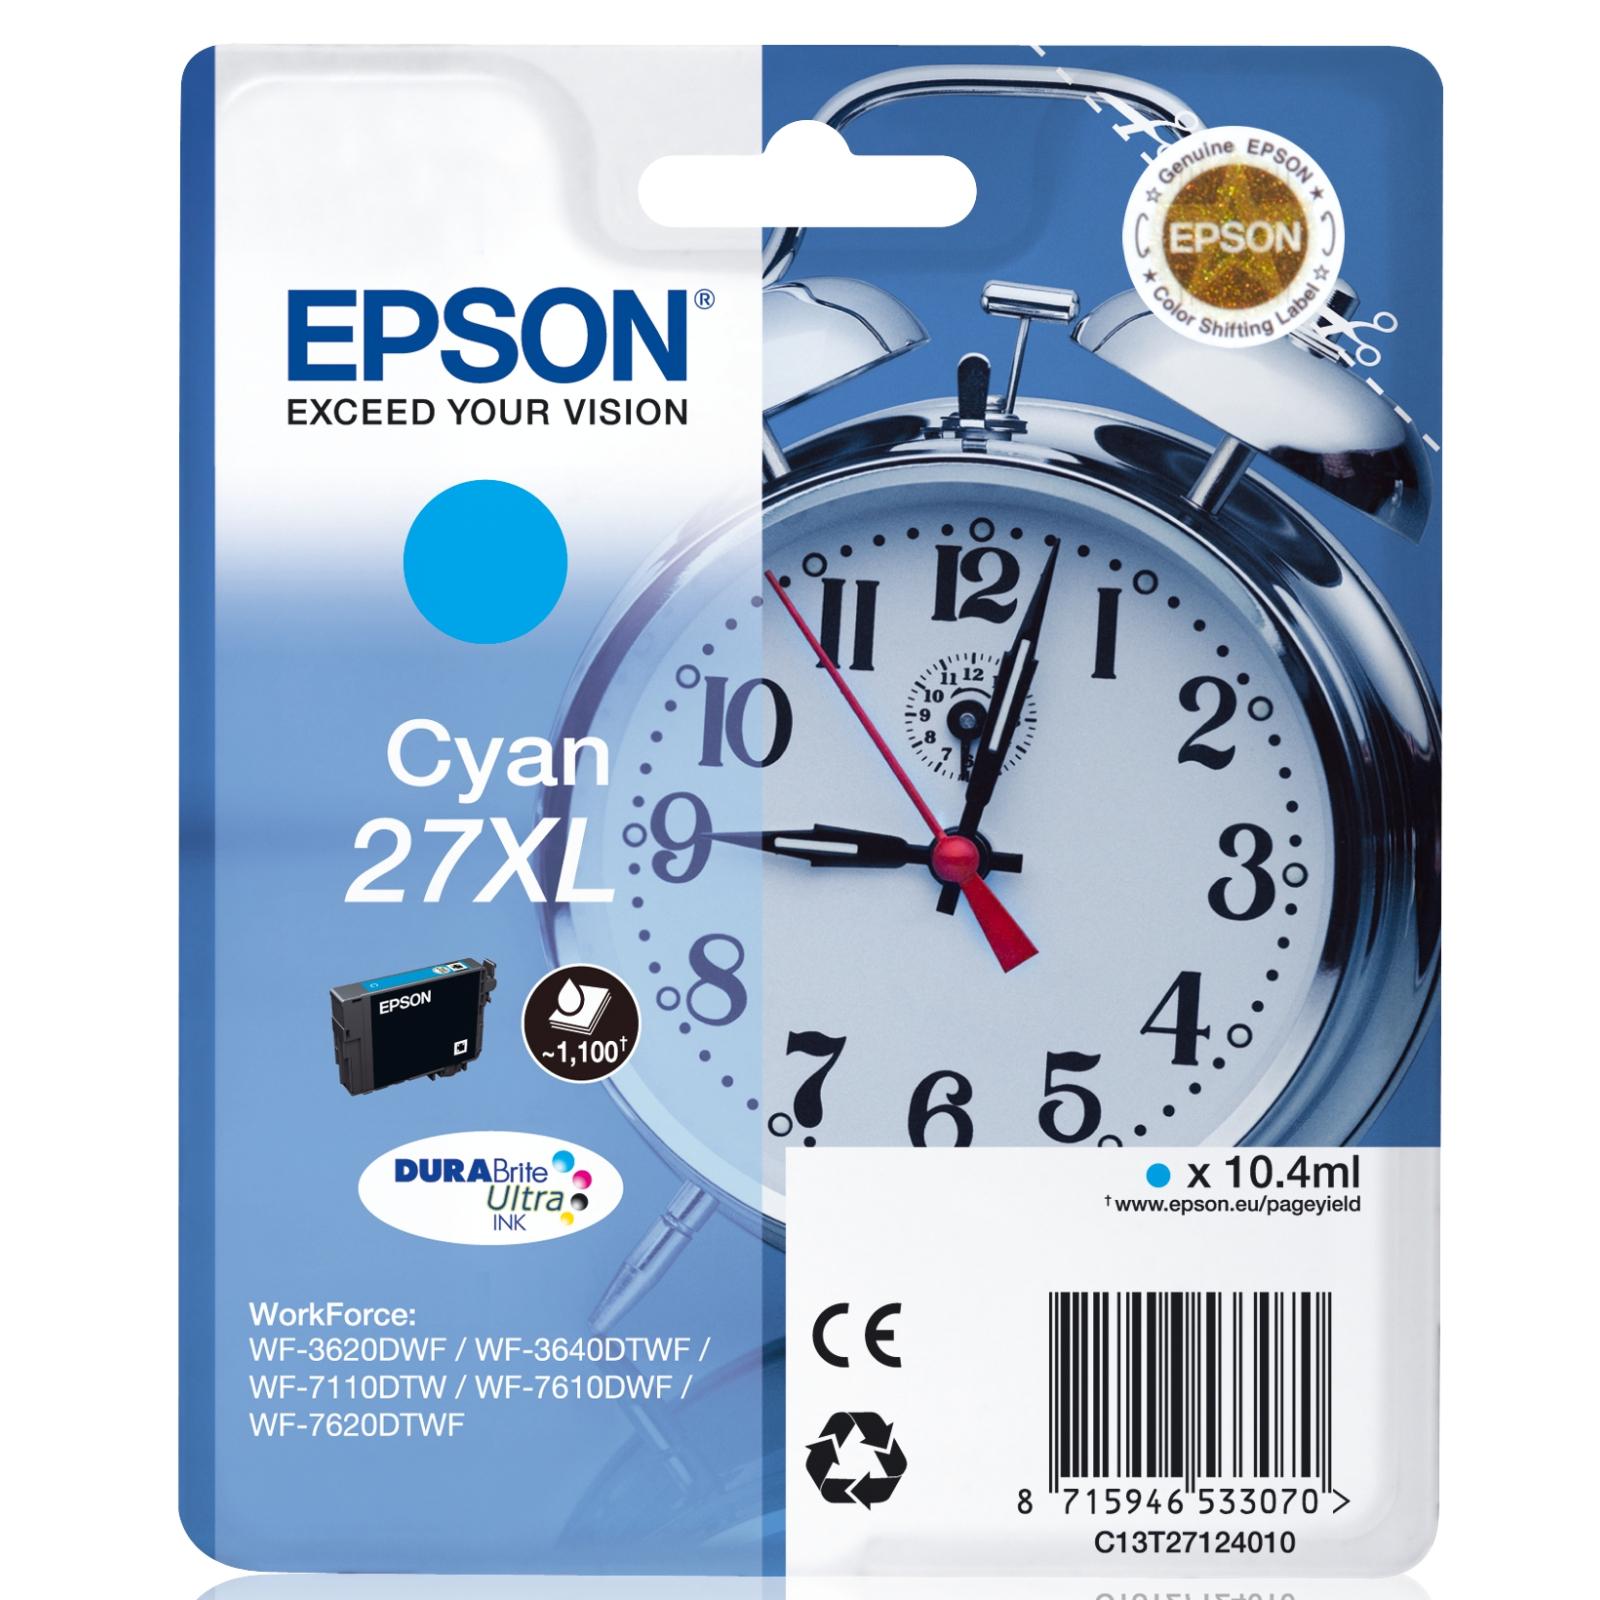 Картридж EPSON 27XL WF-7620 cyan XL (C13T27124020/C13T27124022)